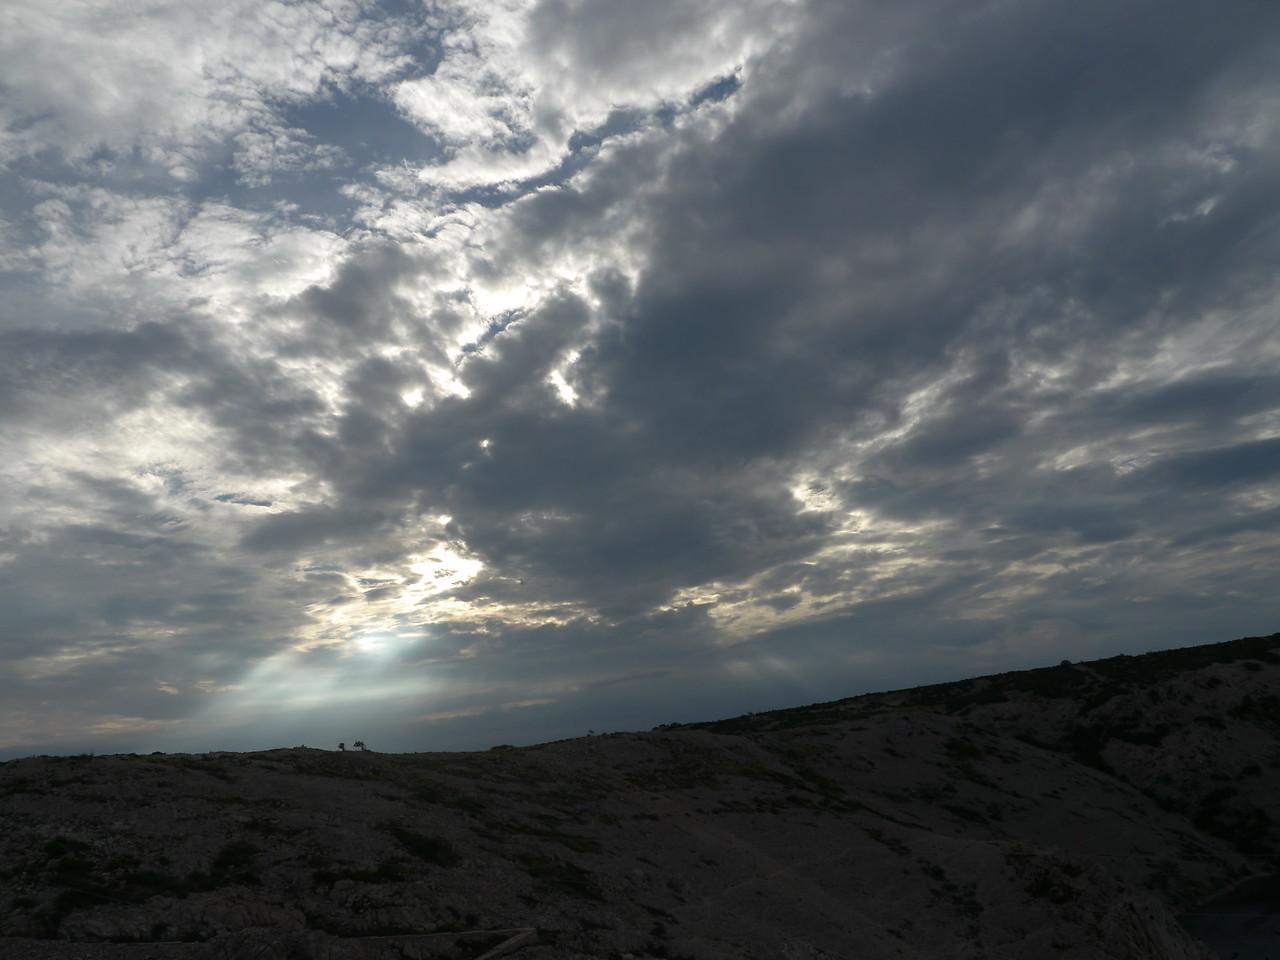 @RobAngSept. 2014 / Maslenica, Rovanjska, Zadarska, HRV, Kroatien, 46 m ü/M,